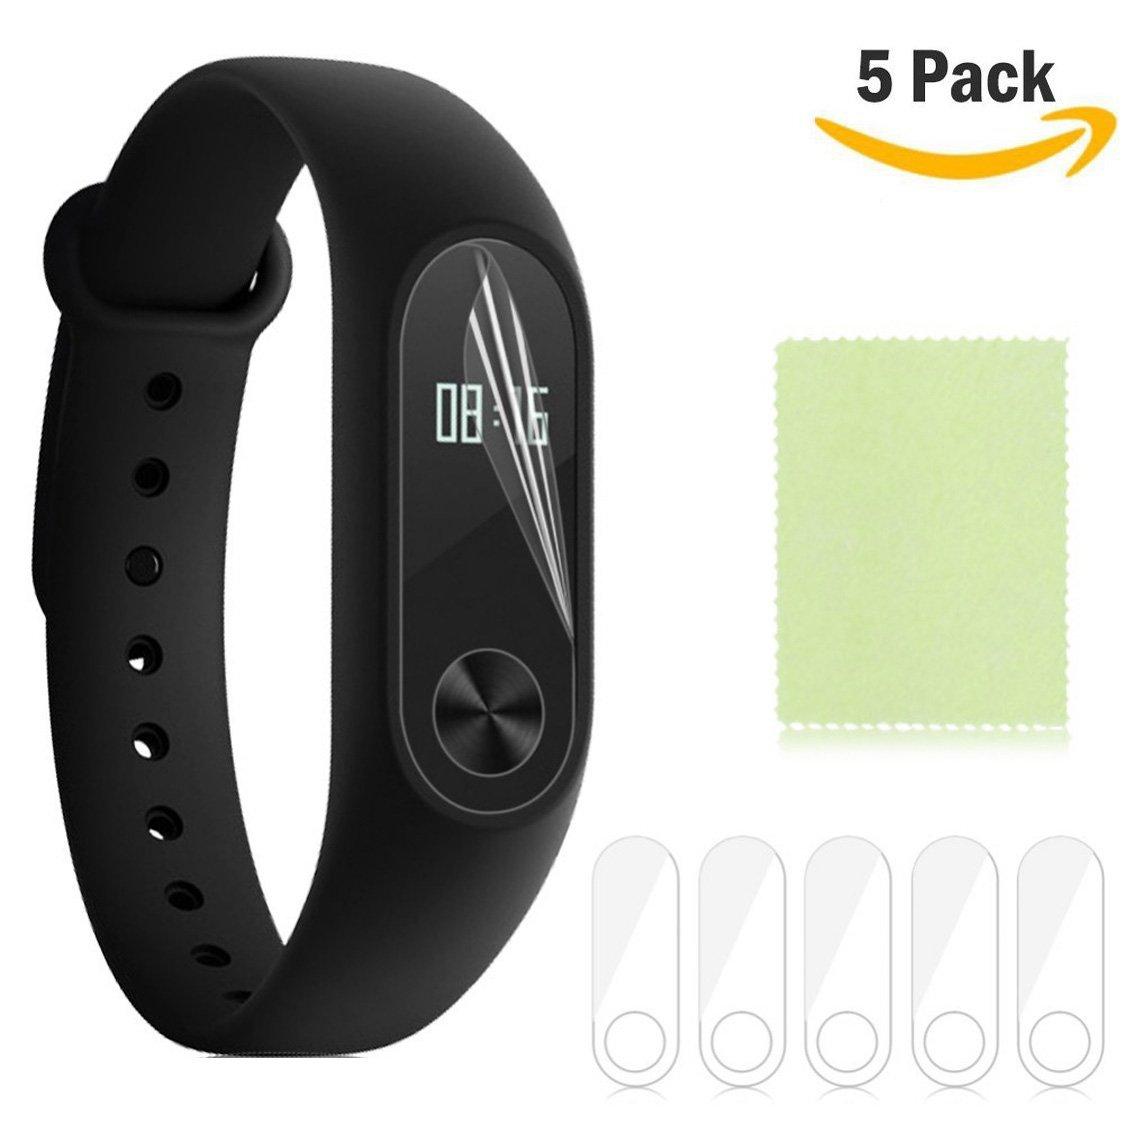 5 Pack Xiaomi Mi Band 2 Screen Protector Yafine Ultra Slim Hd Original Black Free Guard Pcs Clear Front Phone Film For Smart Wristband Bracelet